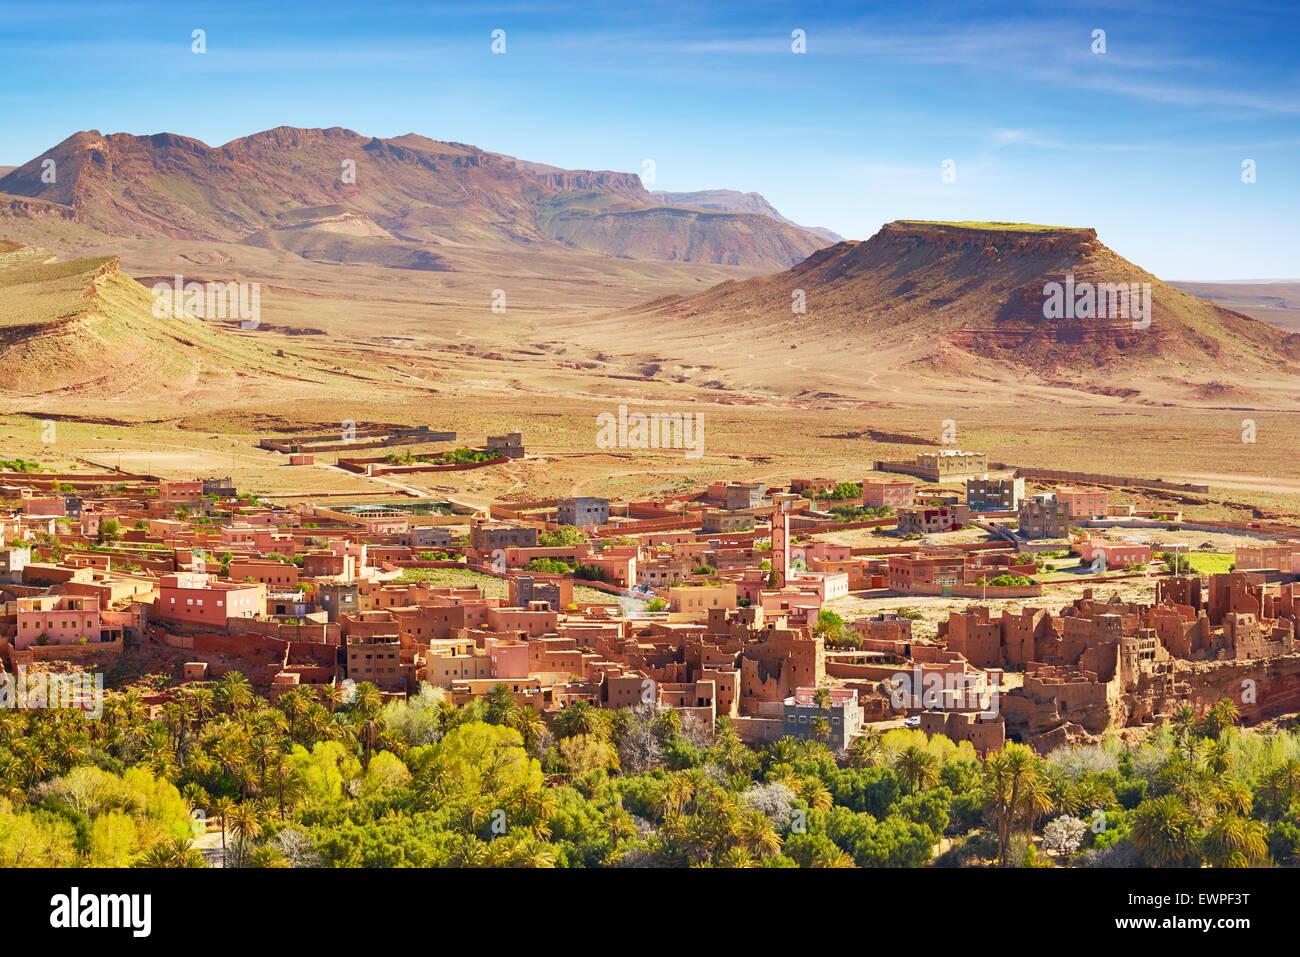 Tinghir, Todra region.  Atlas Mountain region, Morocco - Stock Image